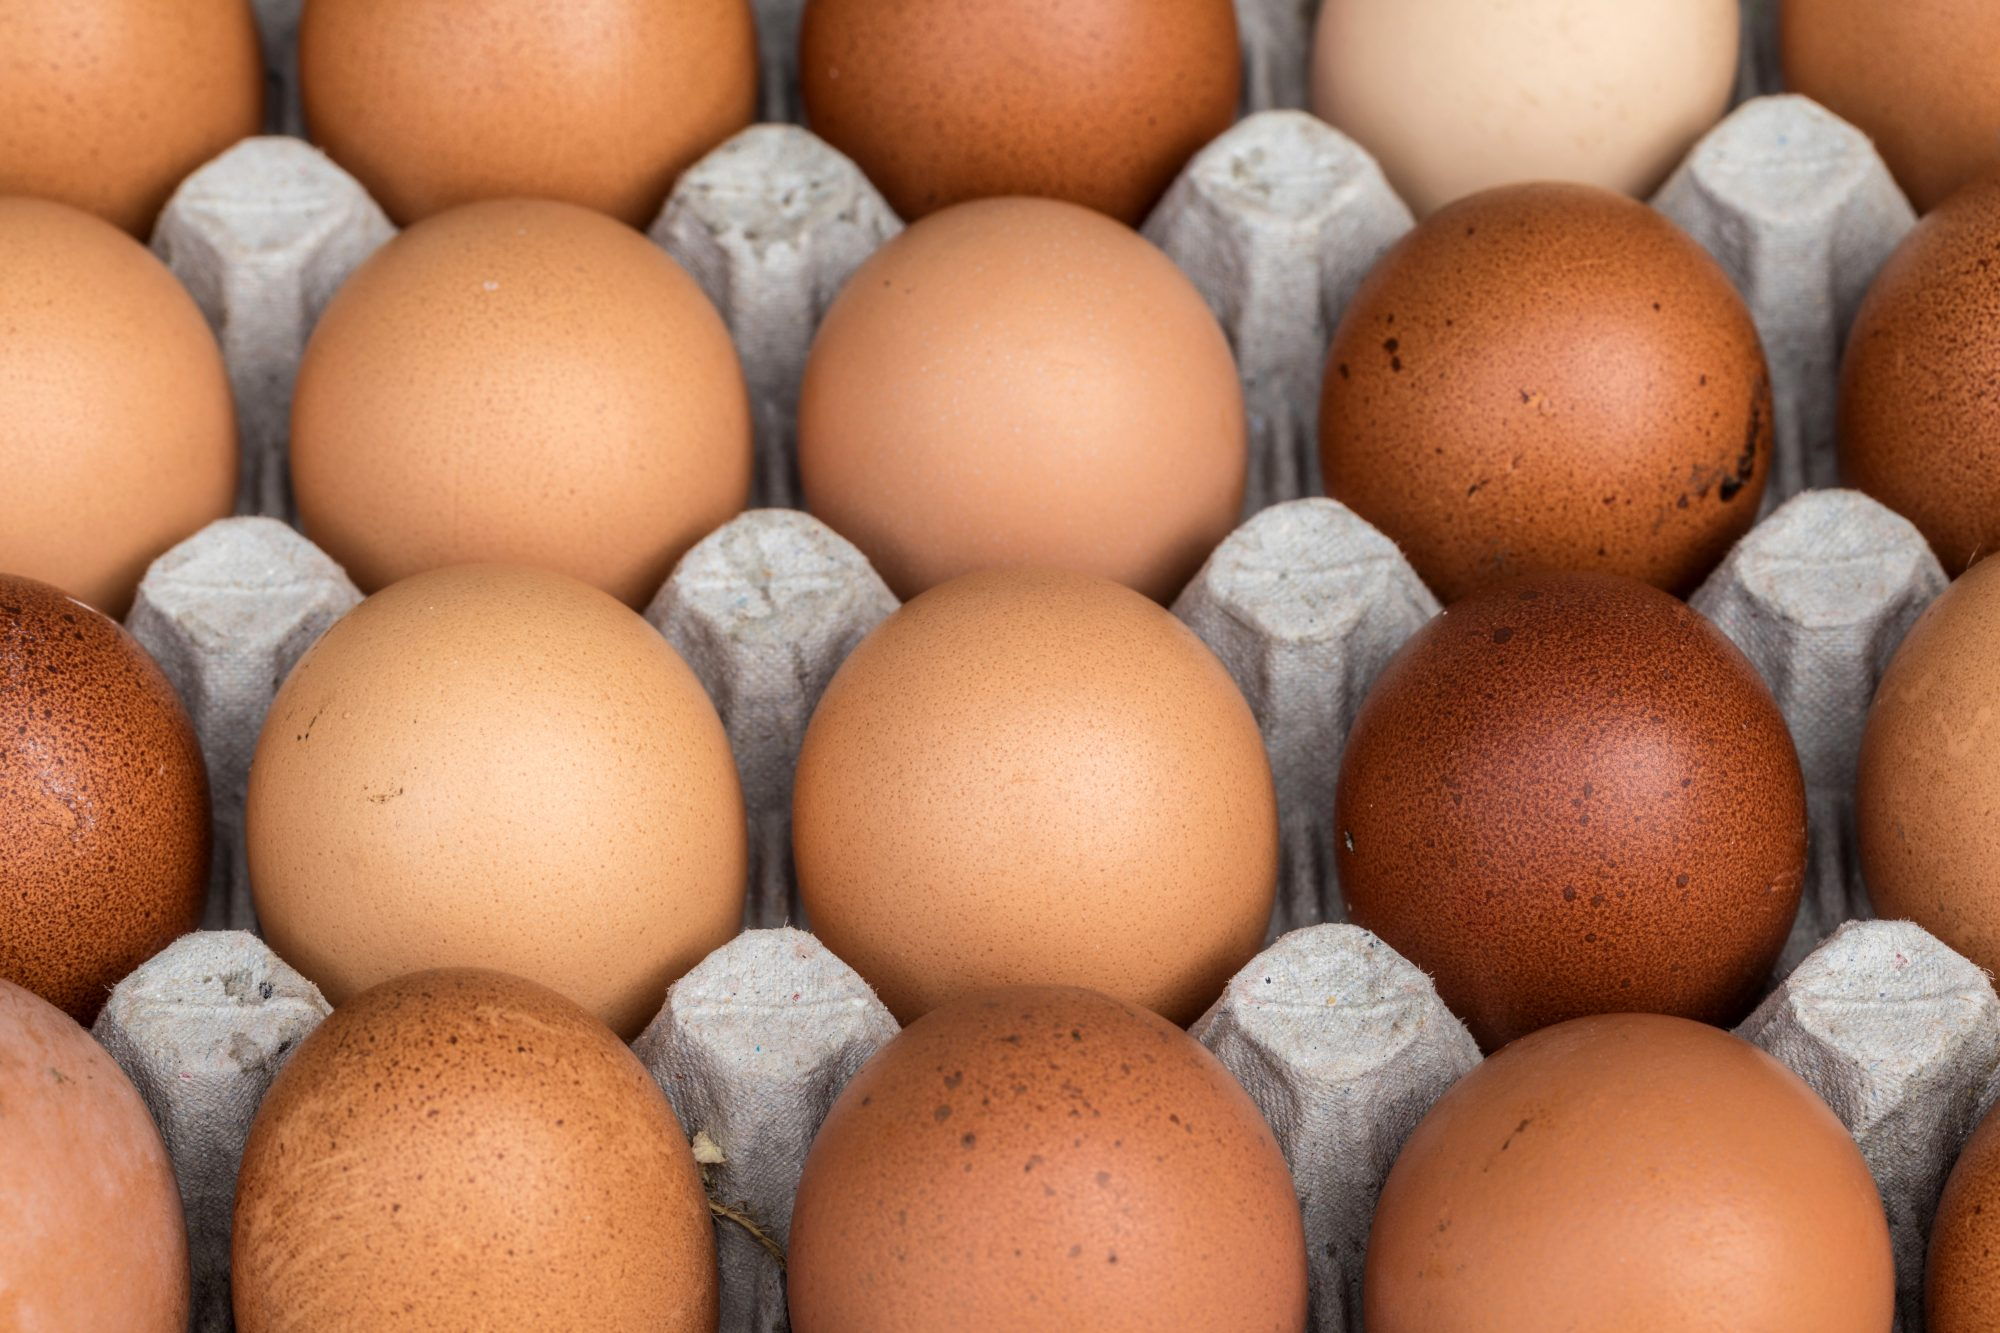 getty eggs 040119